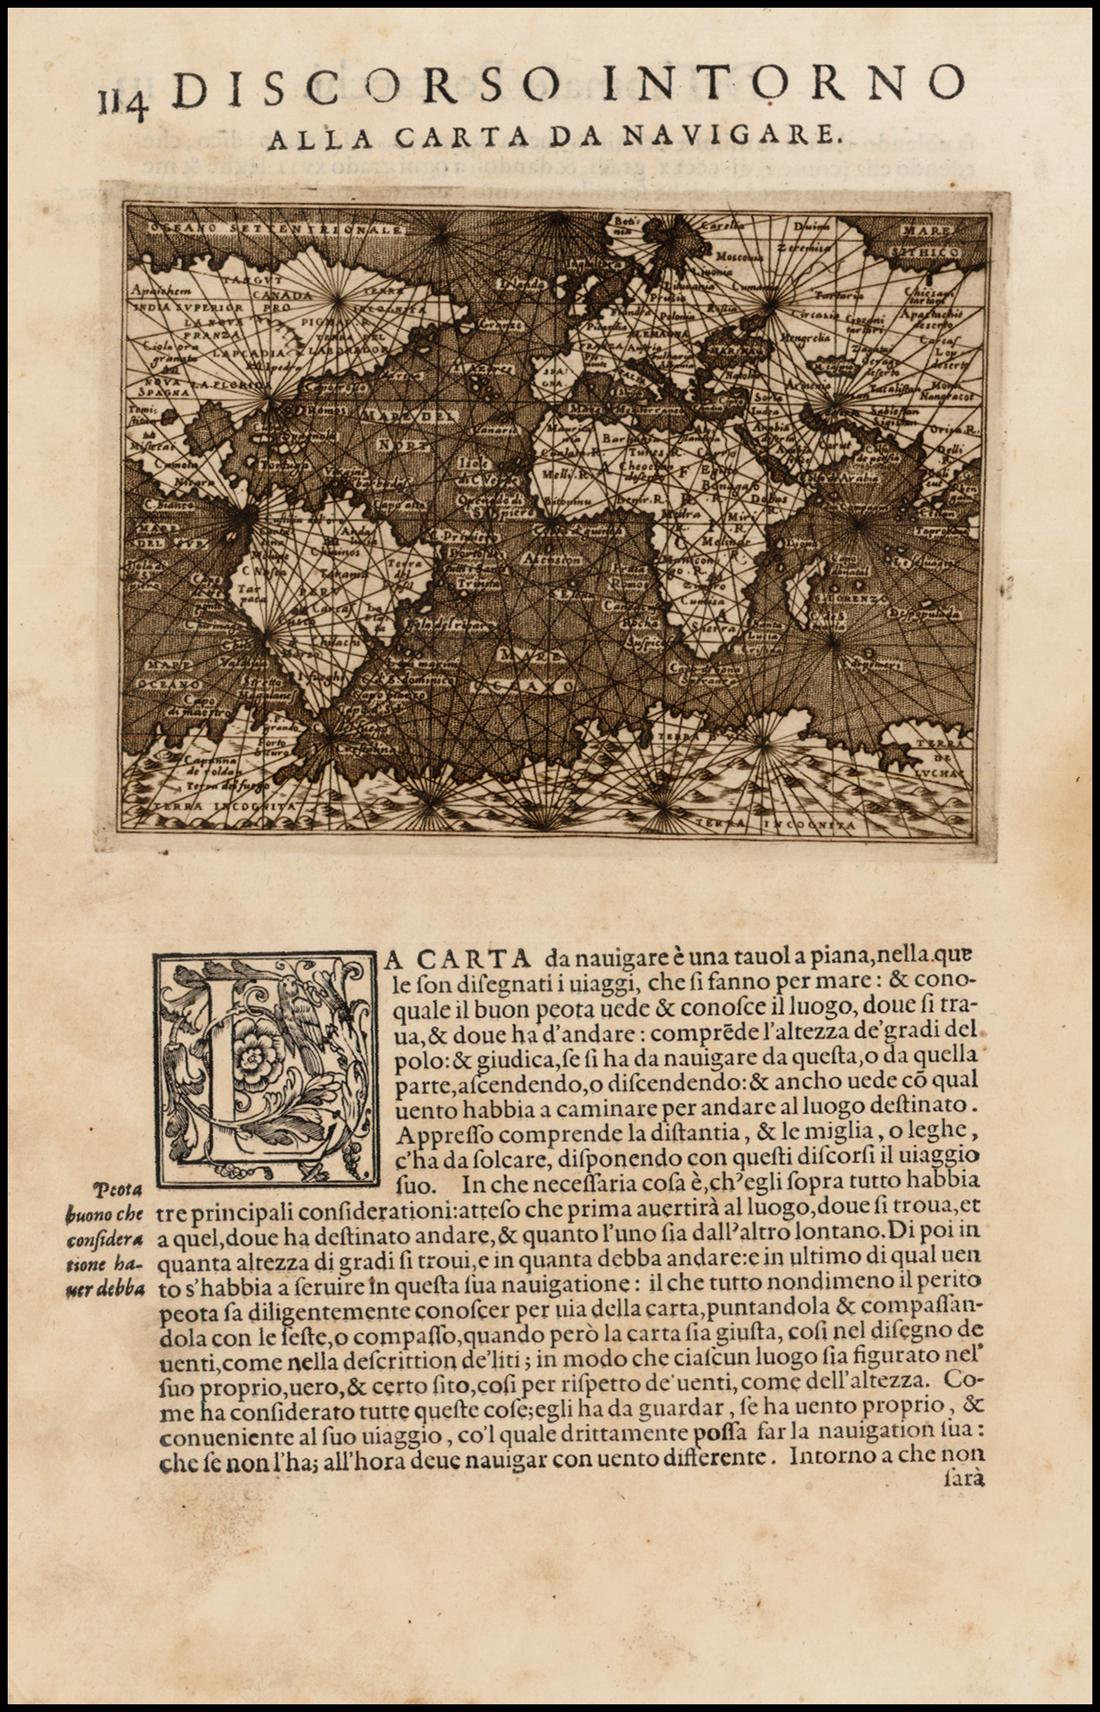 1576 Tomasso Porcacchi